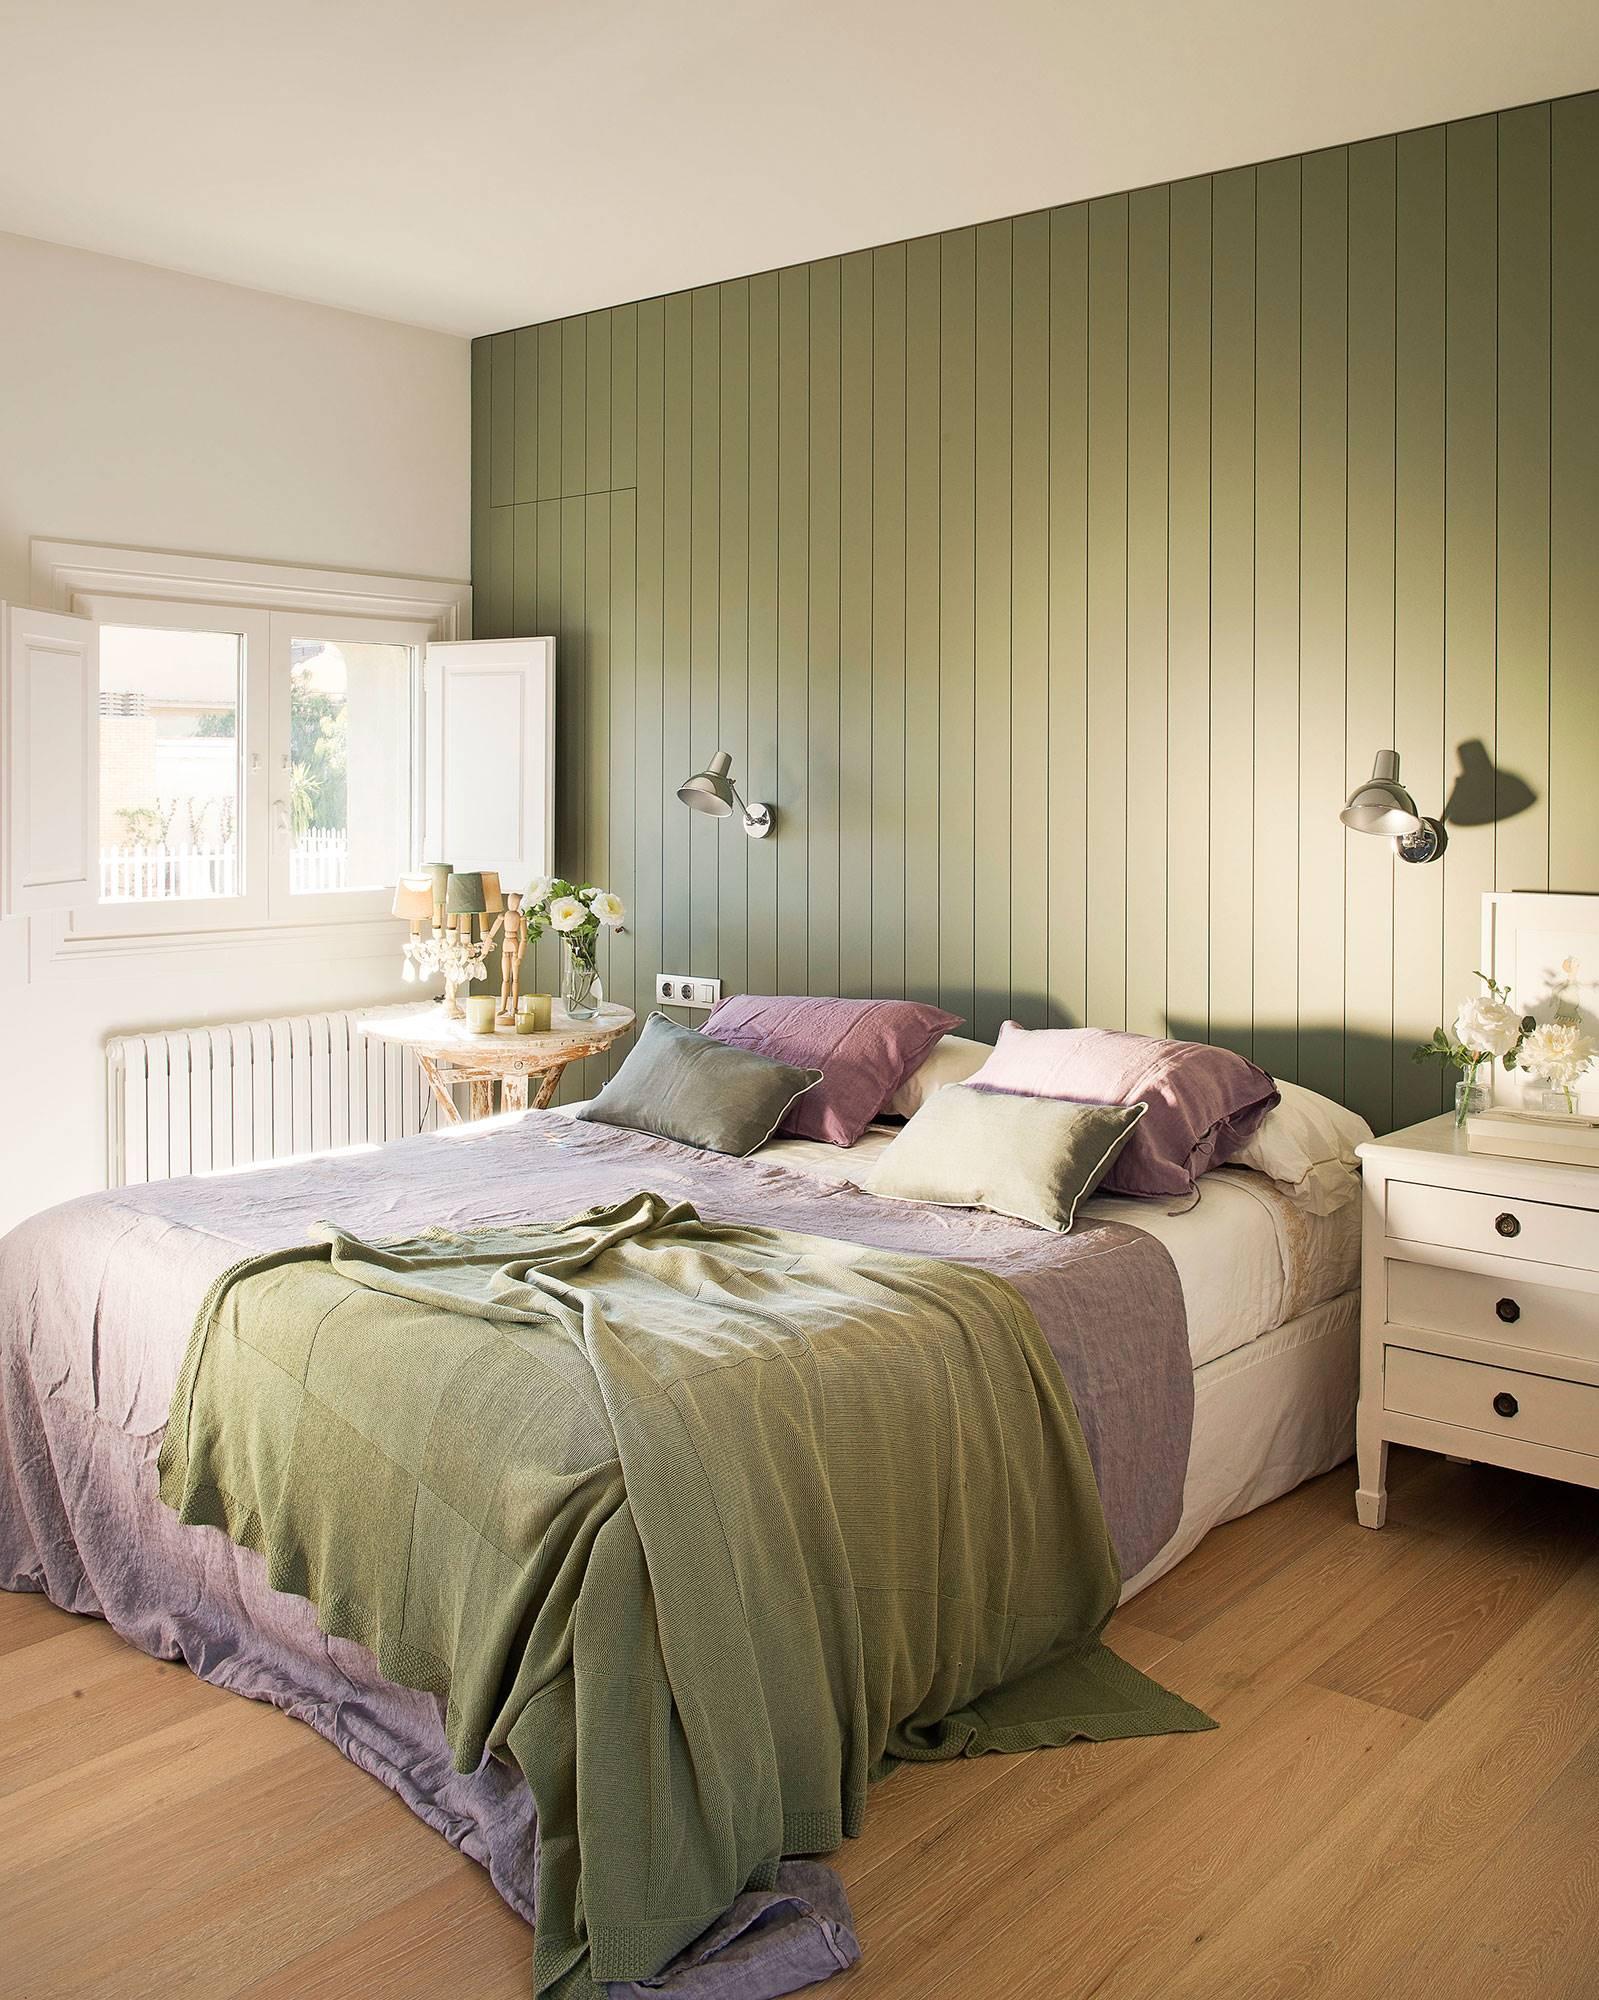 Dormitorio-principal-con-pared-verde-b64837f7 4a6d1c0d. Dormitorio-principal-con-pared-verde-359579